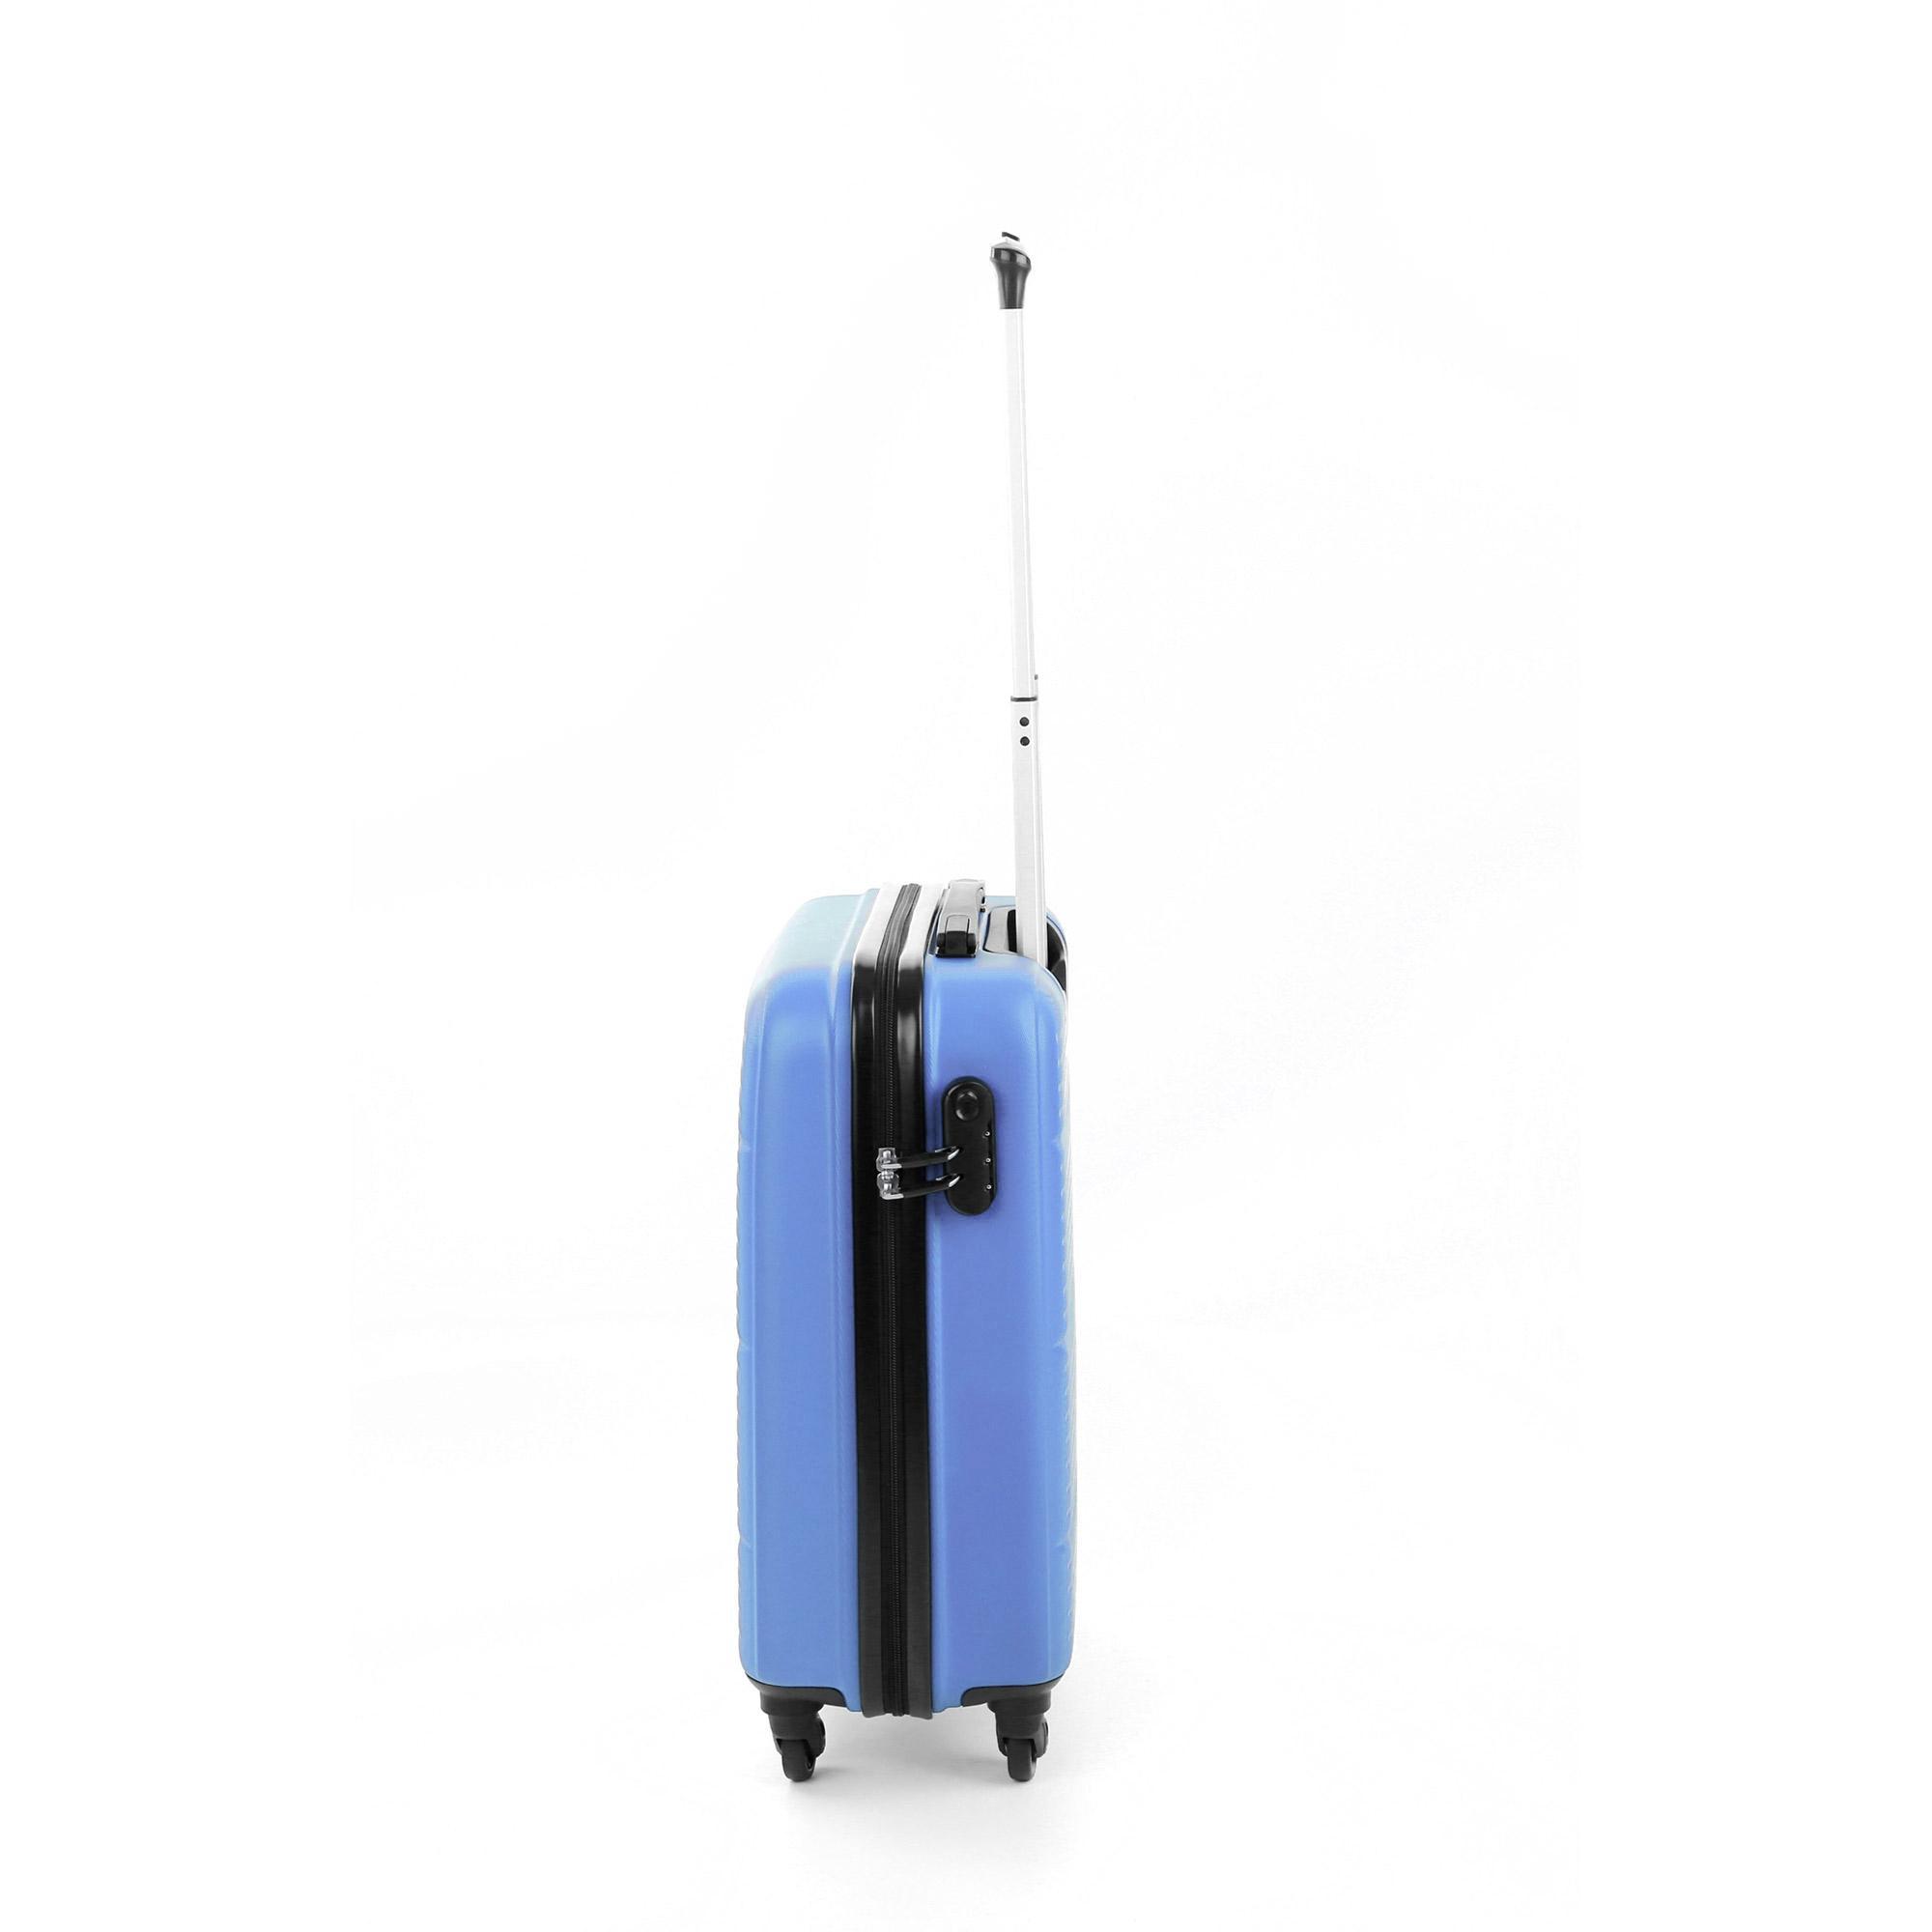 Cabin Luggage  BLUE Modo by Roncato